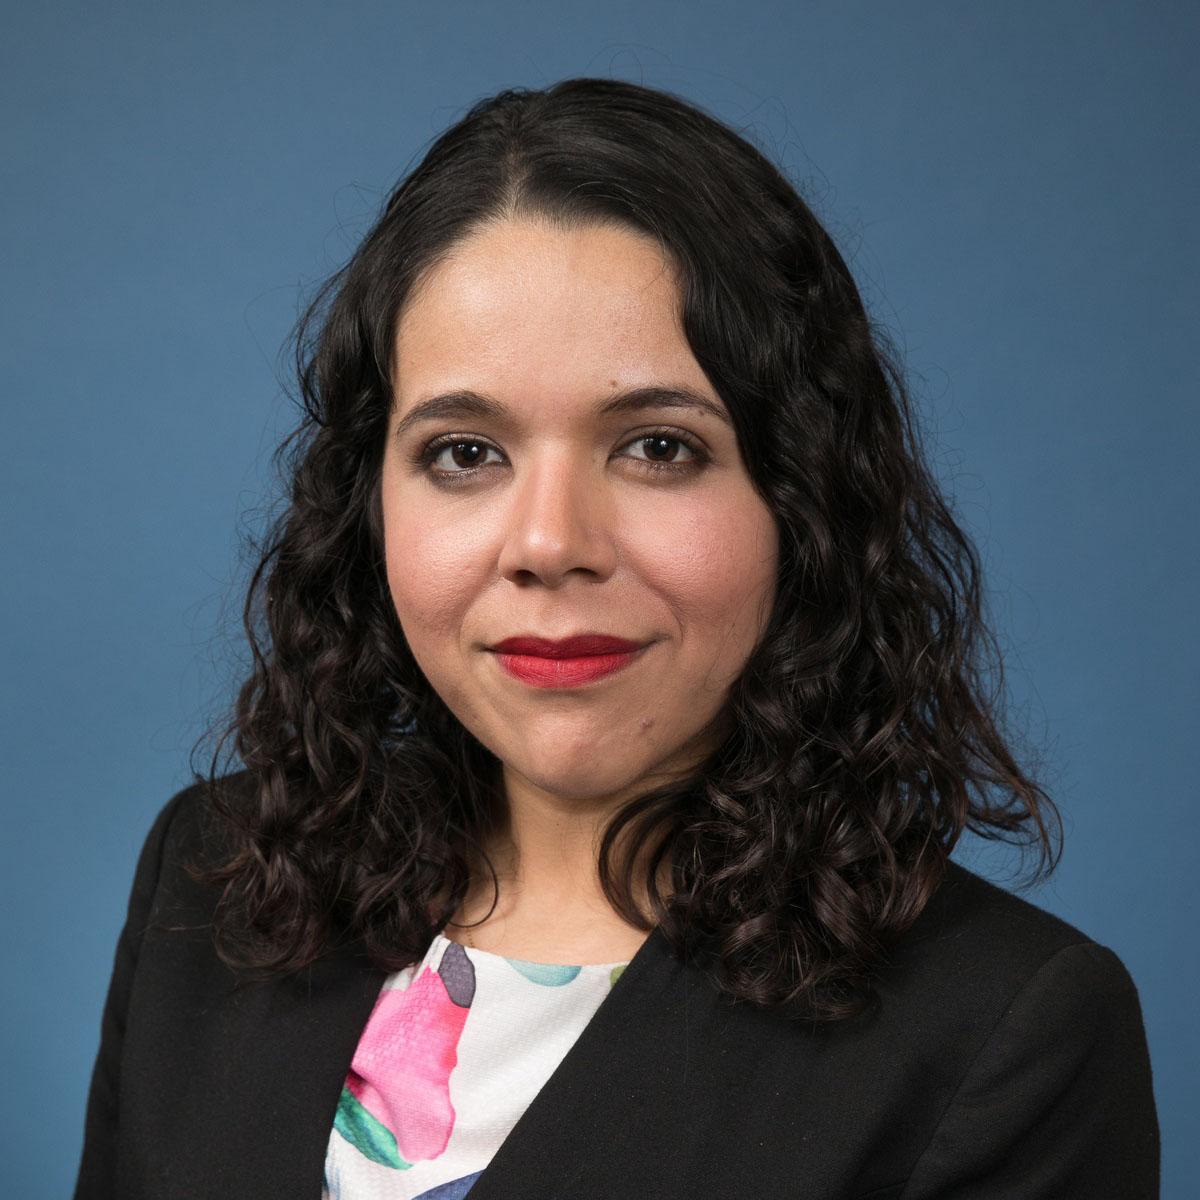 Citlalli Chávez-Nava